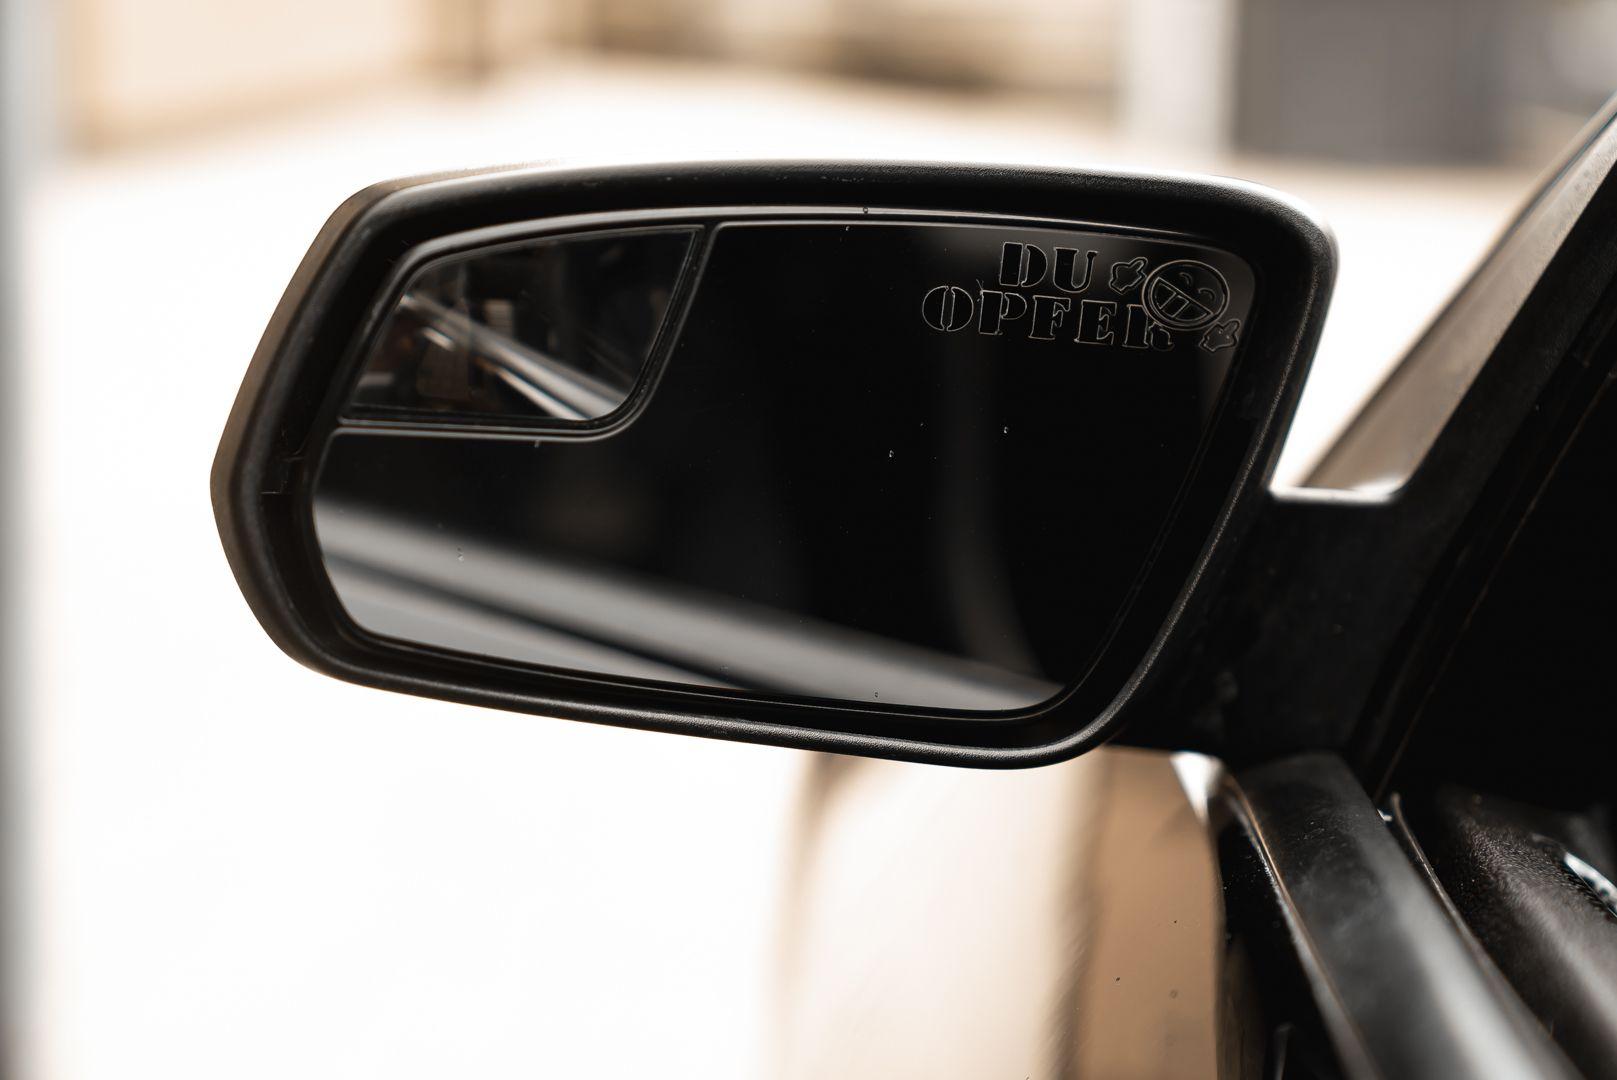 2012 Ford Mustang 5.0 V8 82071